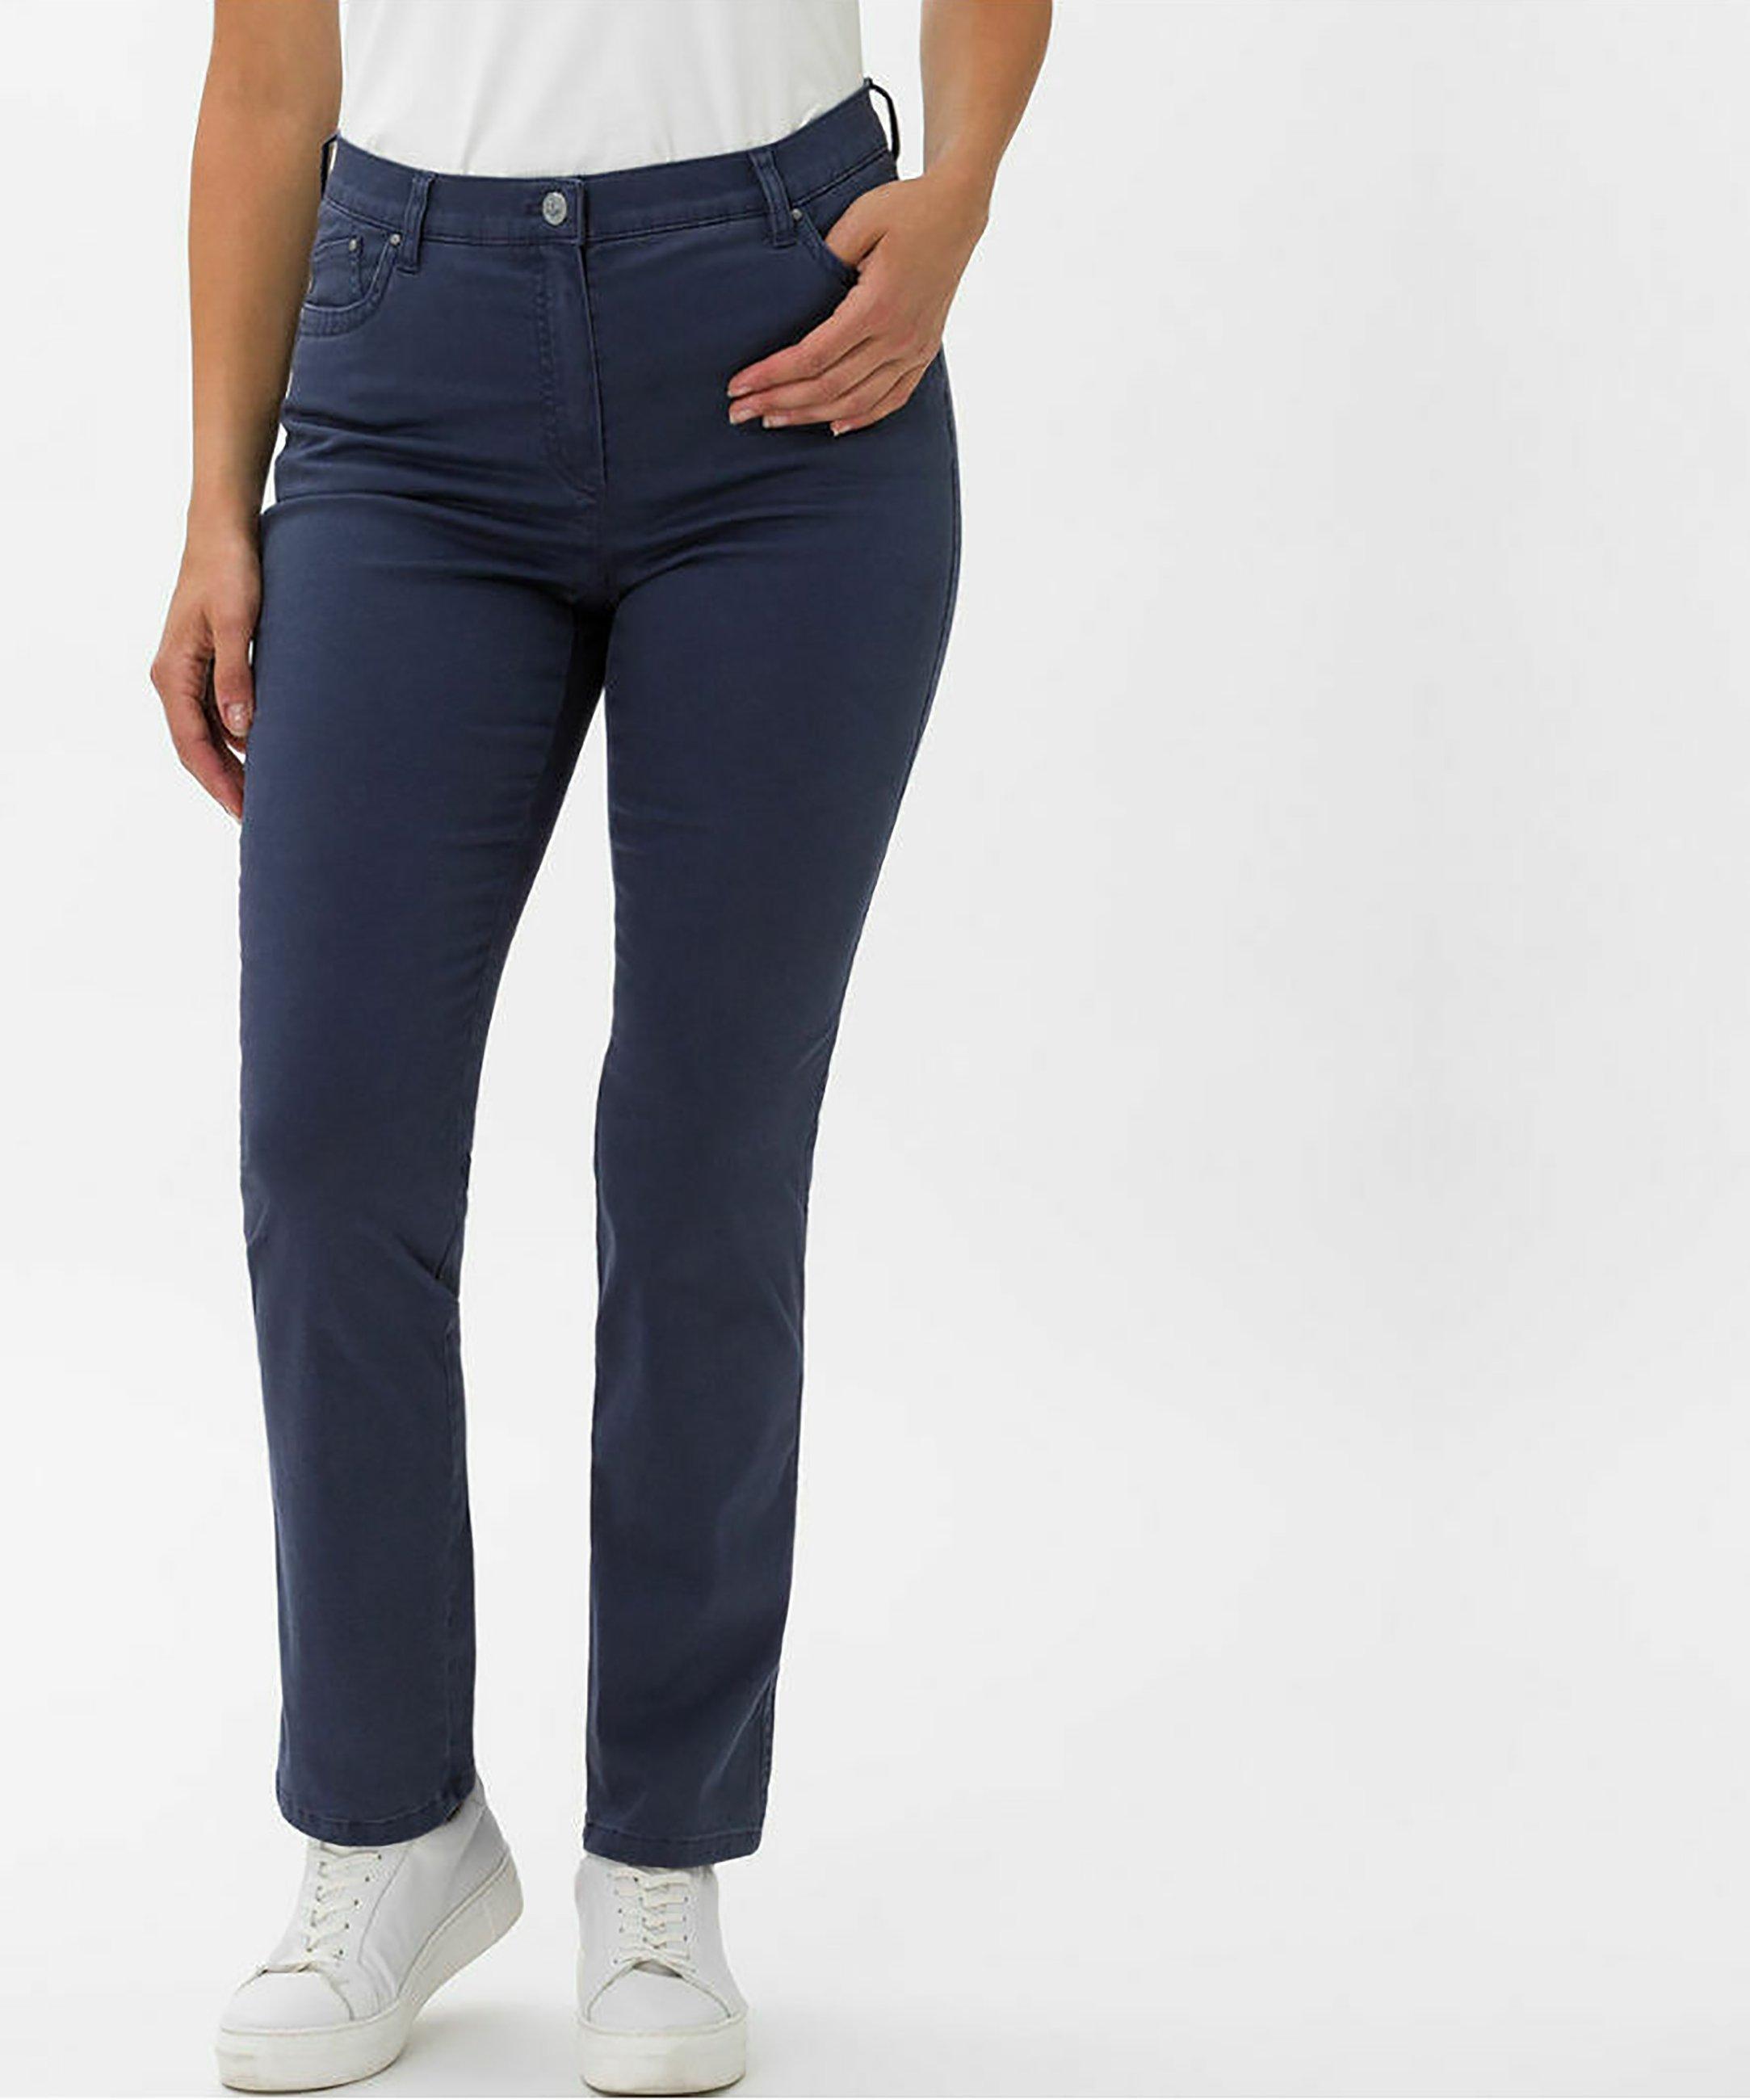 Donna INA  - Pantaloni